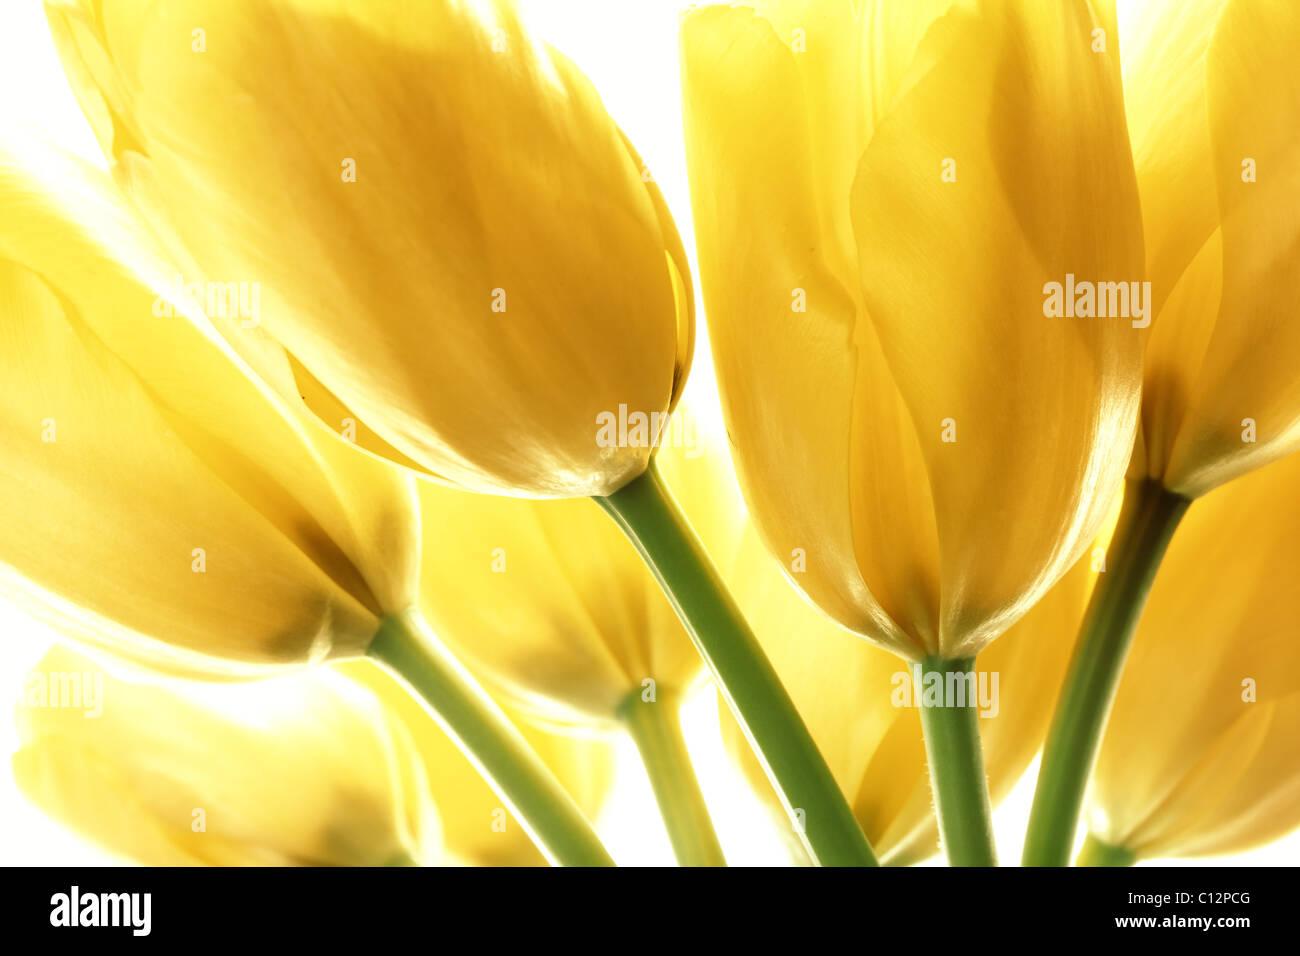 Tulipes jaune isolé sur fond blanc Photo Stock